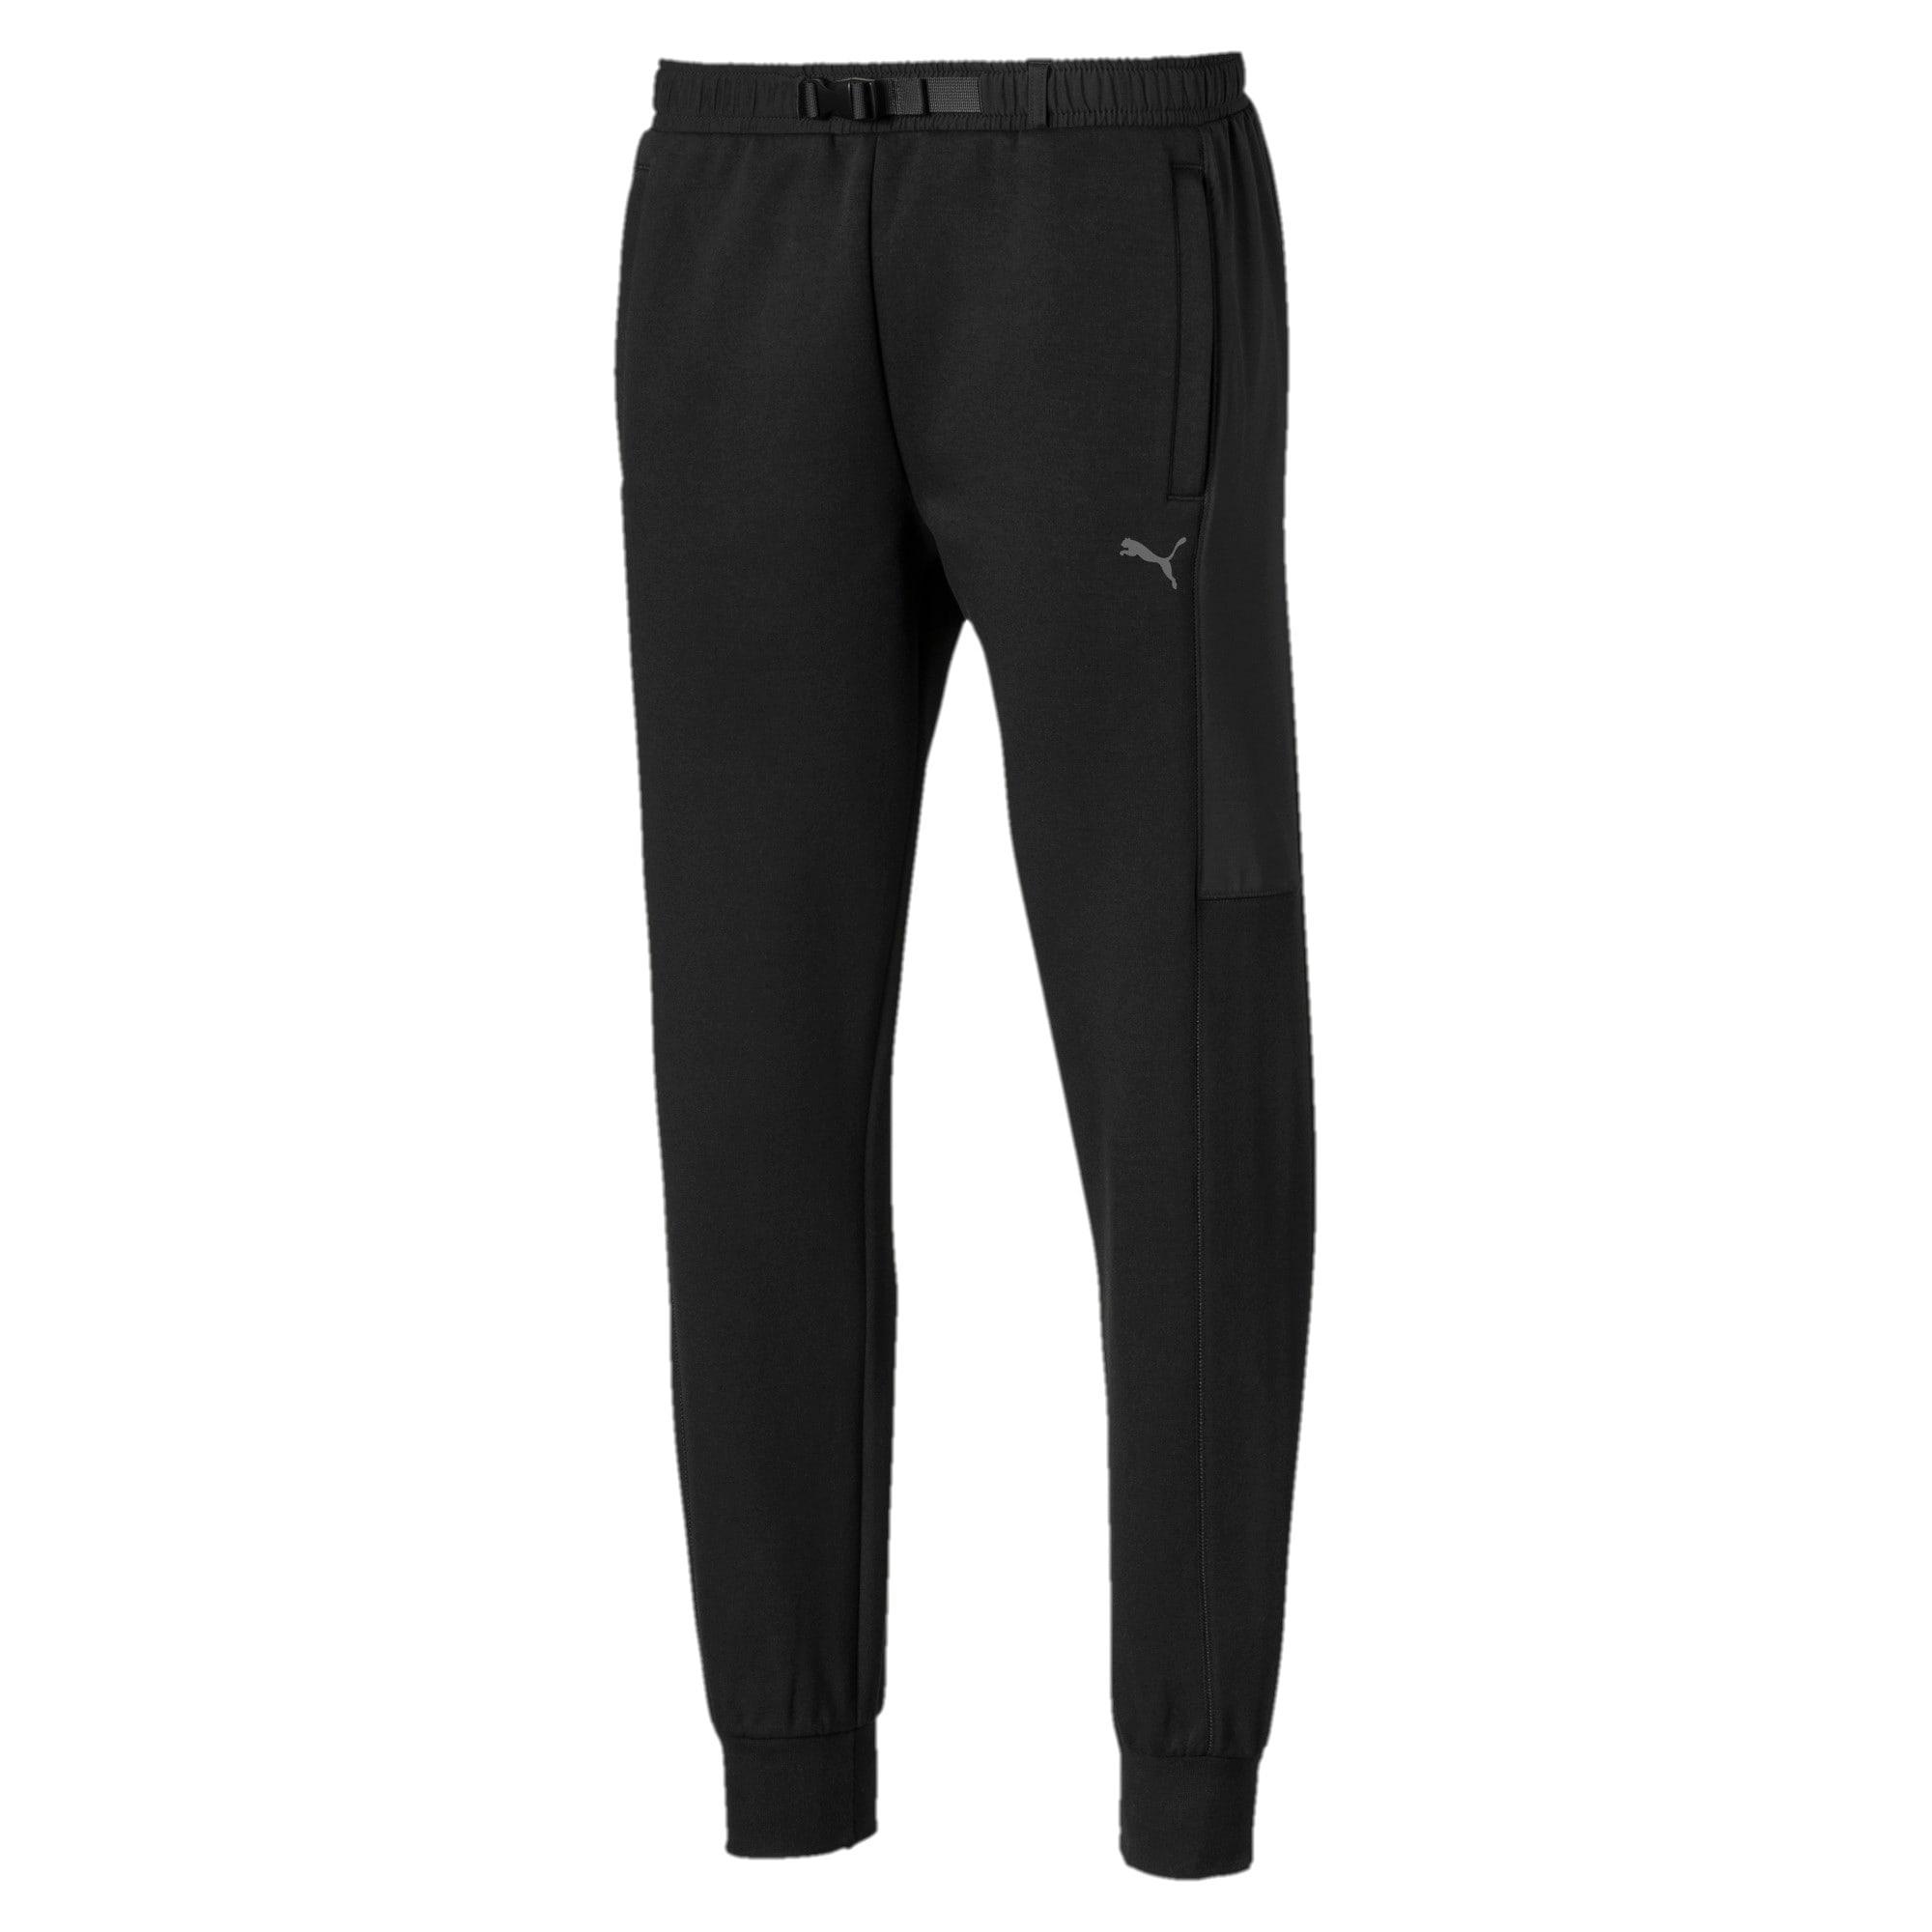 Miniatura 1 de Pantalones deportivos Epoch Hybrid para hombre, Puma Black, mediano